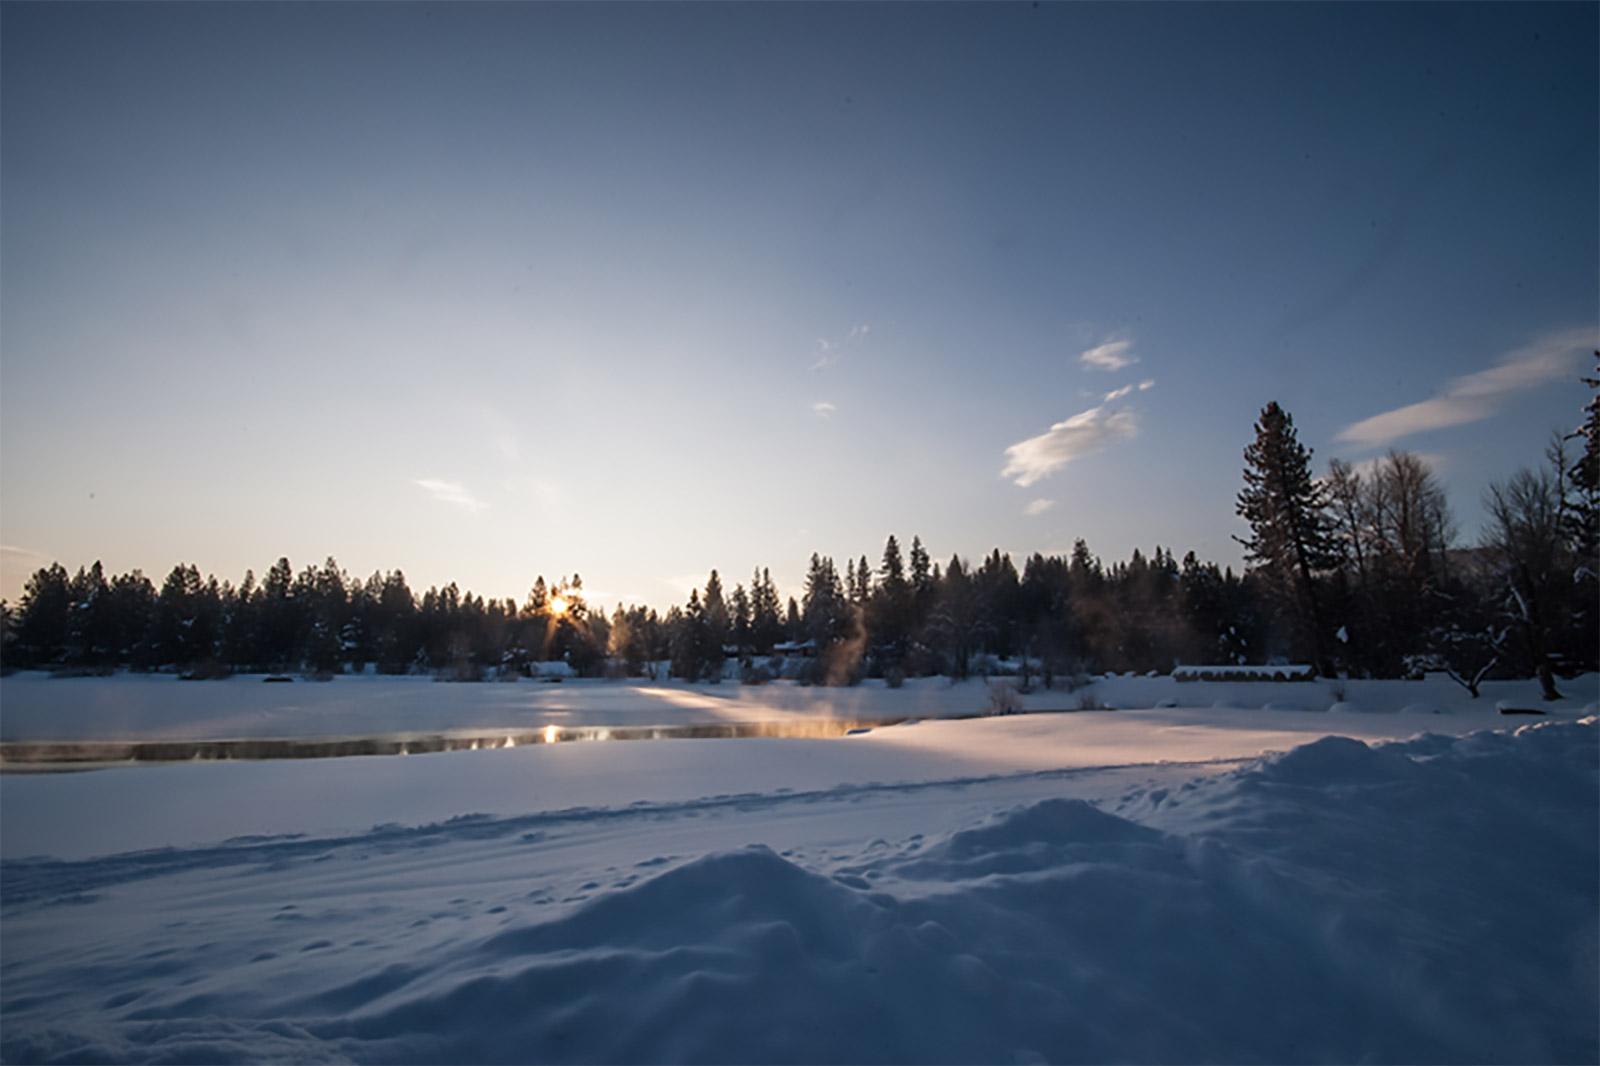 Snow on the Graeagle Mill Pond